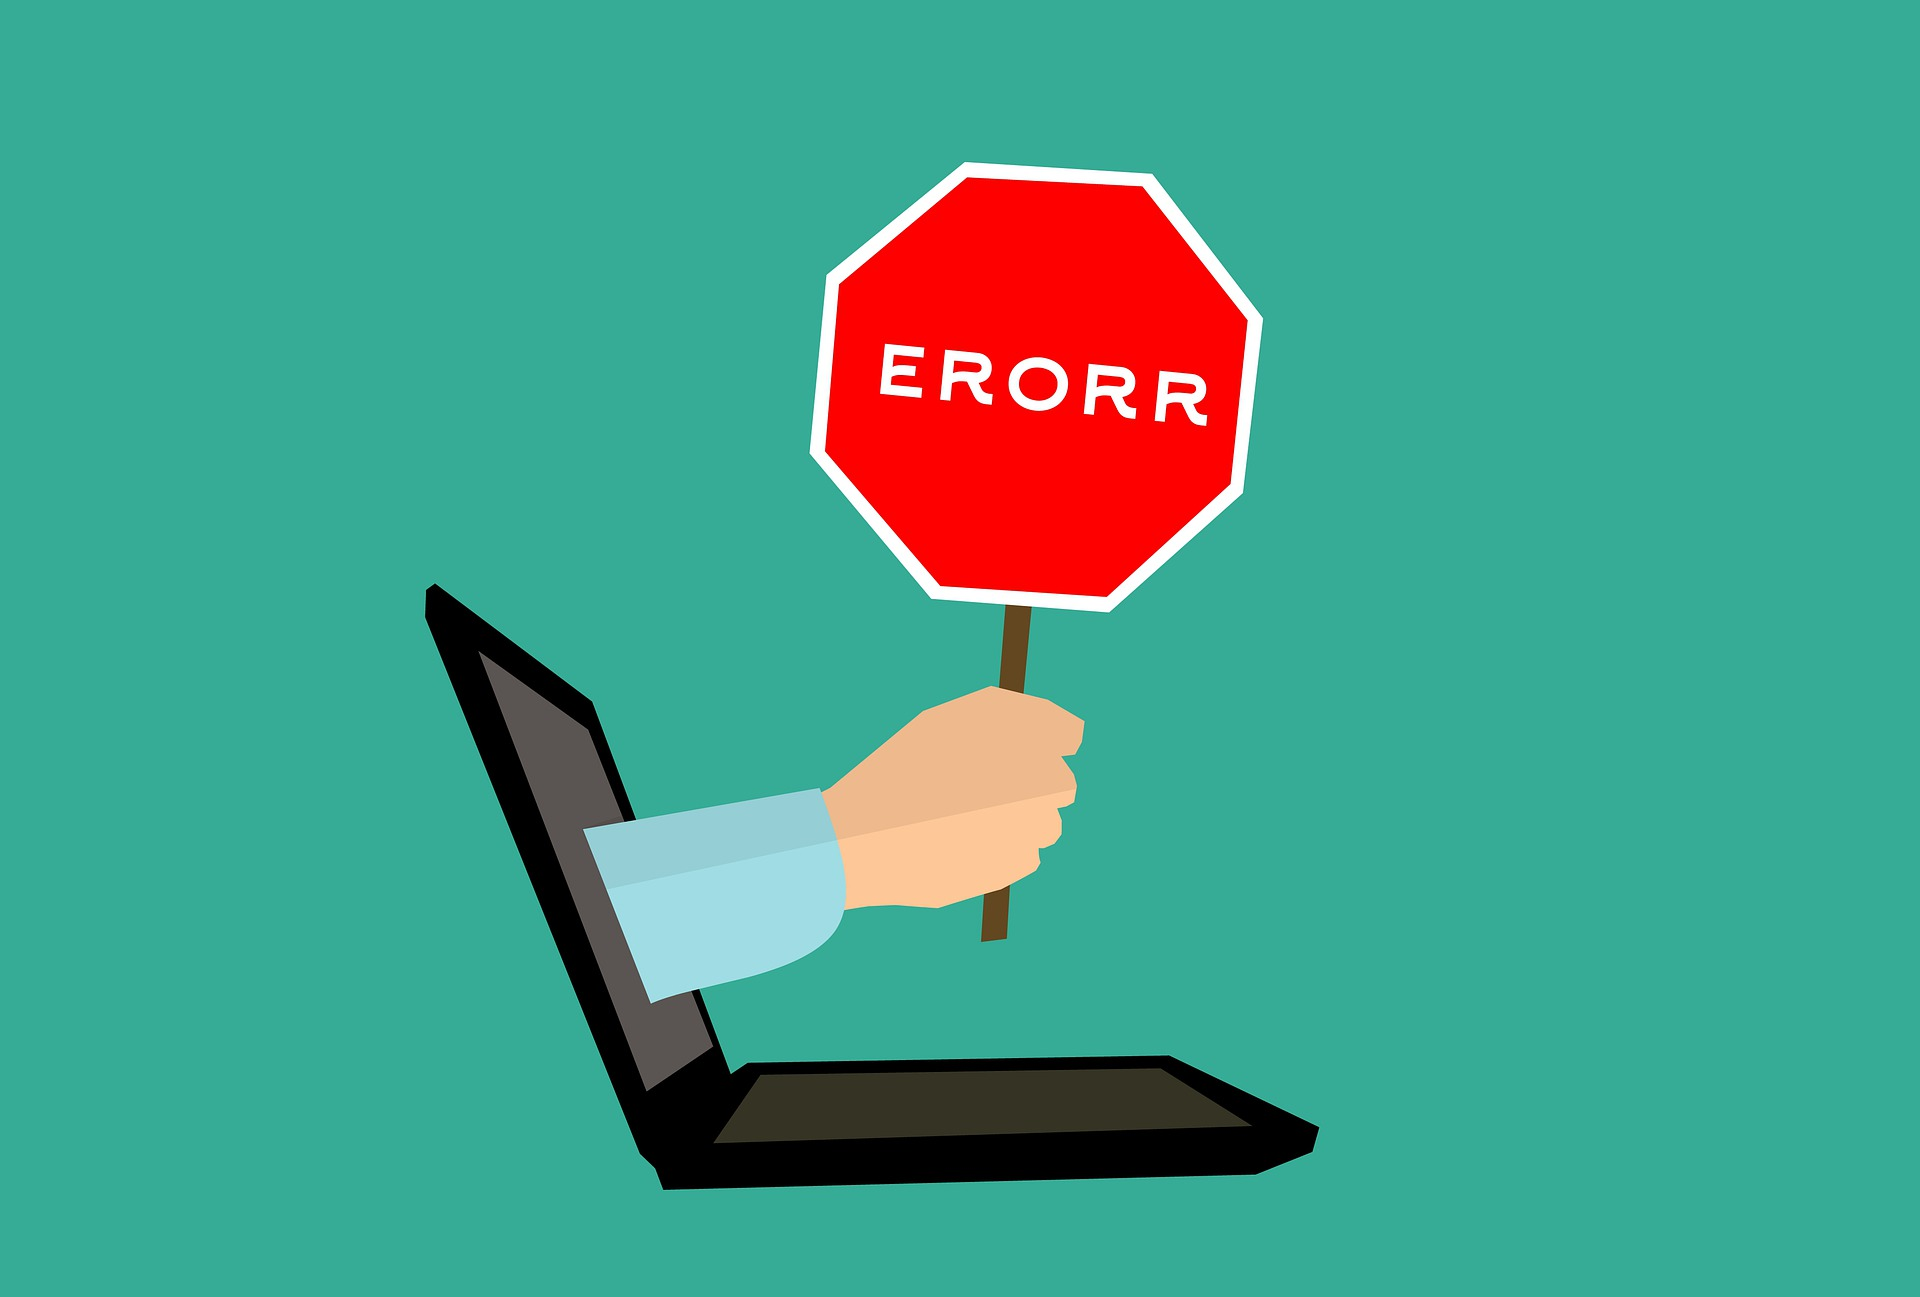 Warning: Imposter Websites with Similar URLs